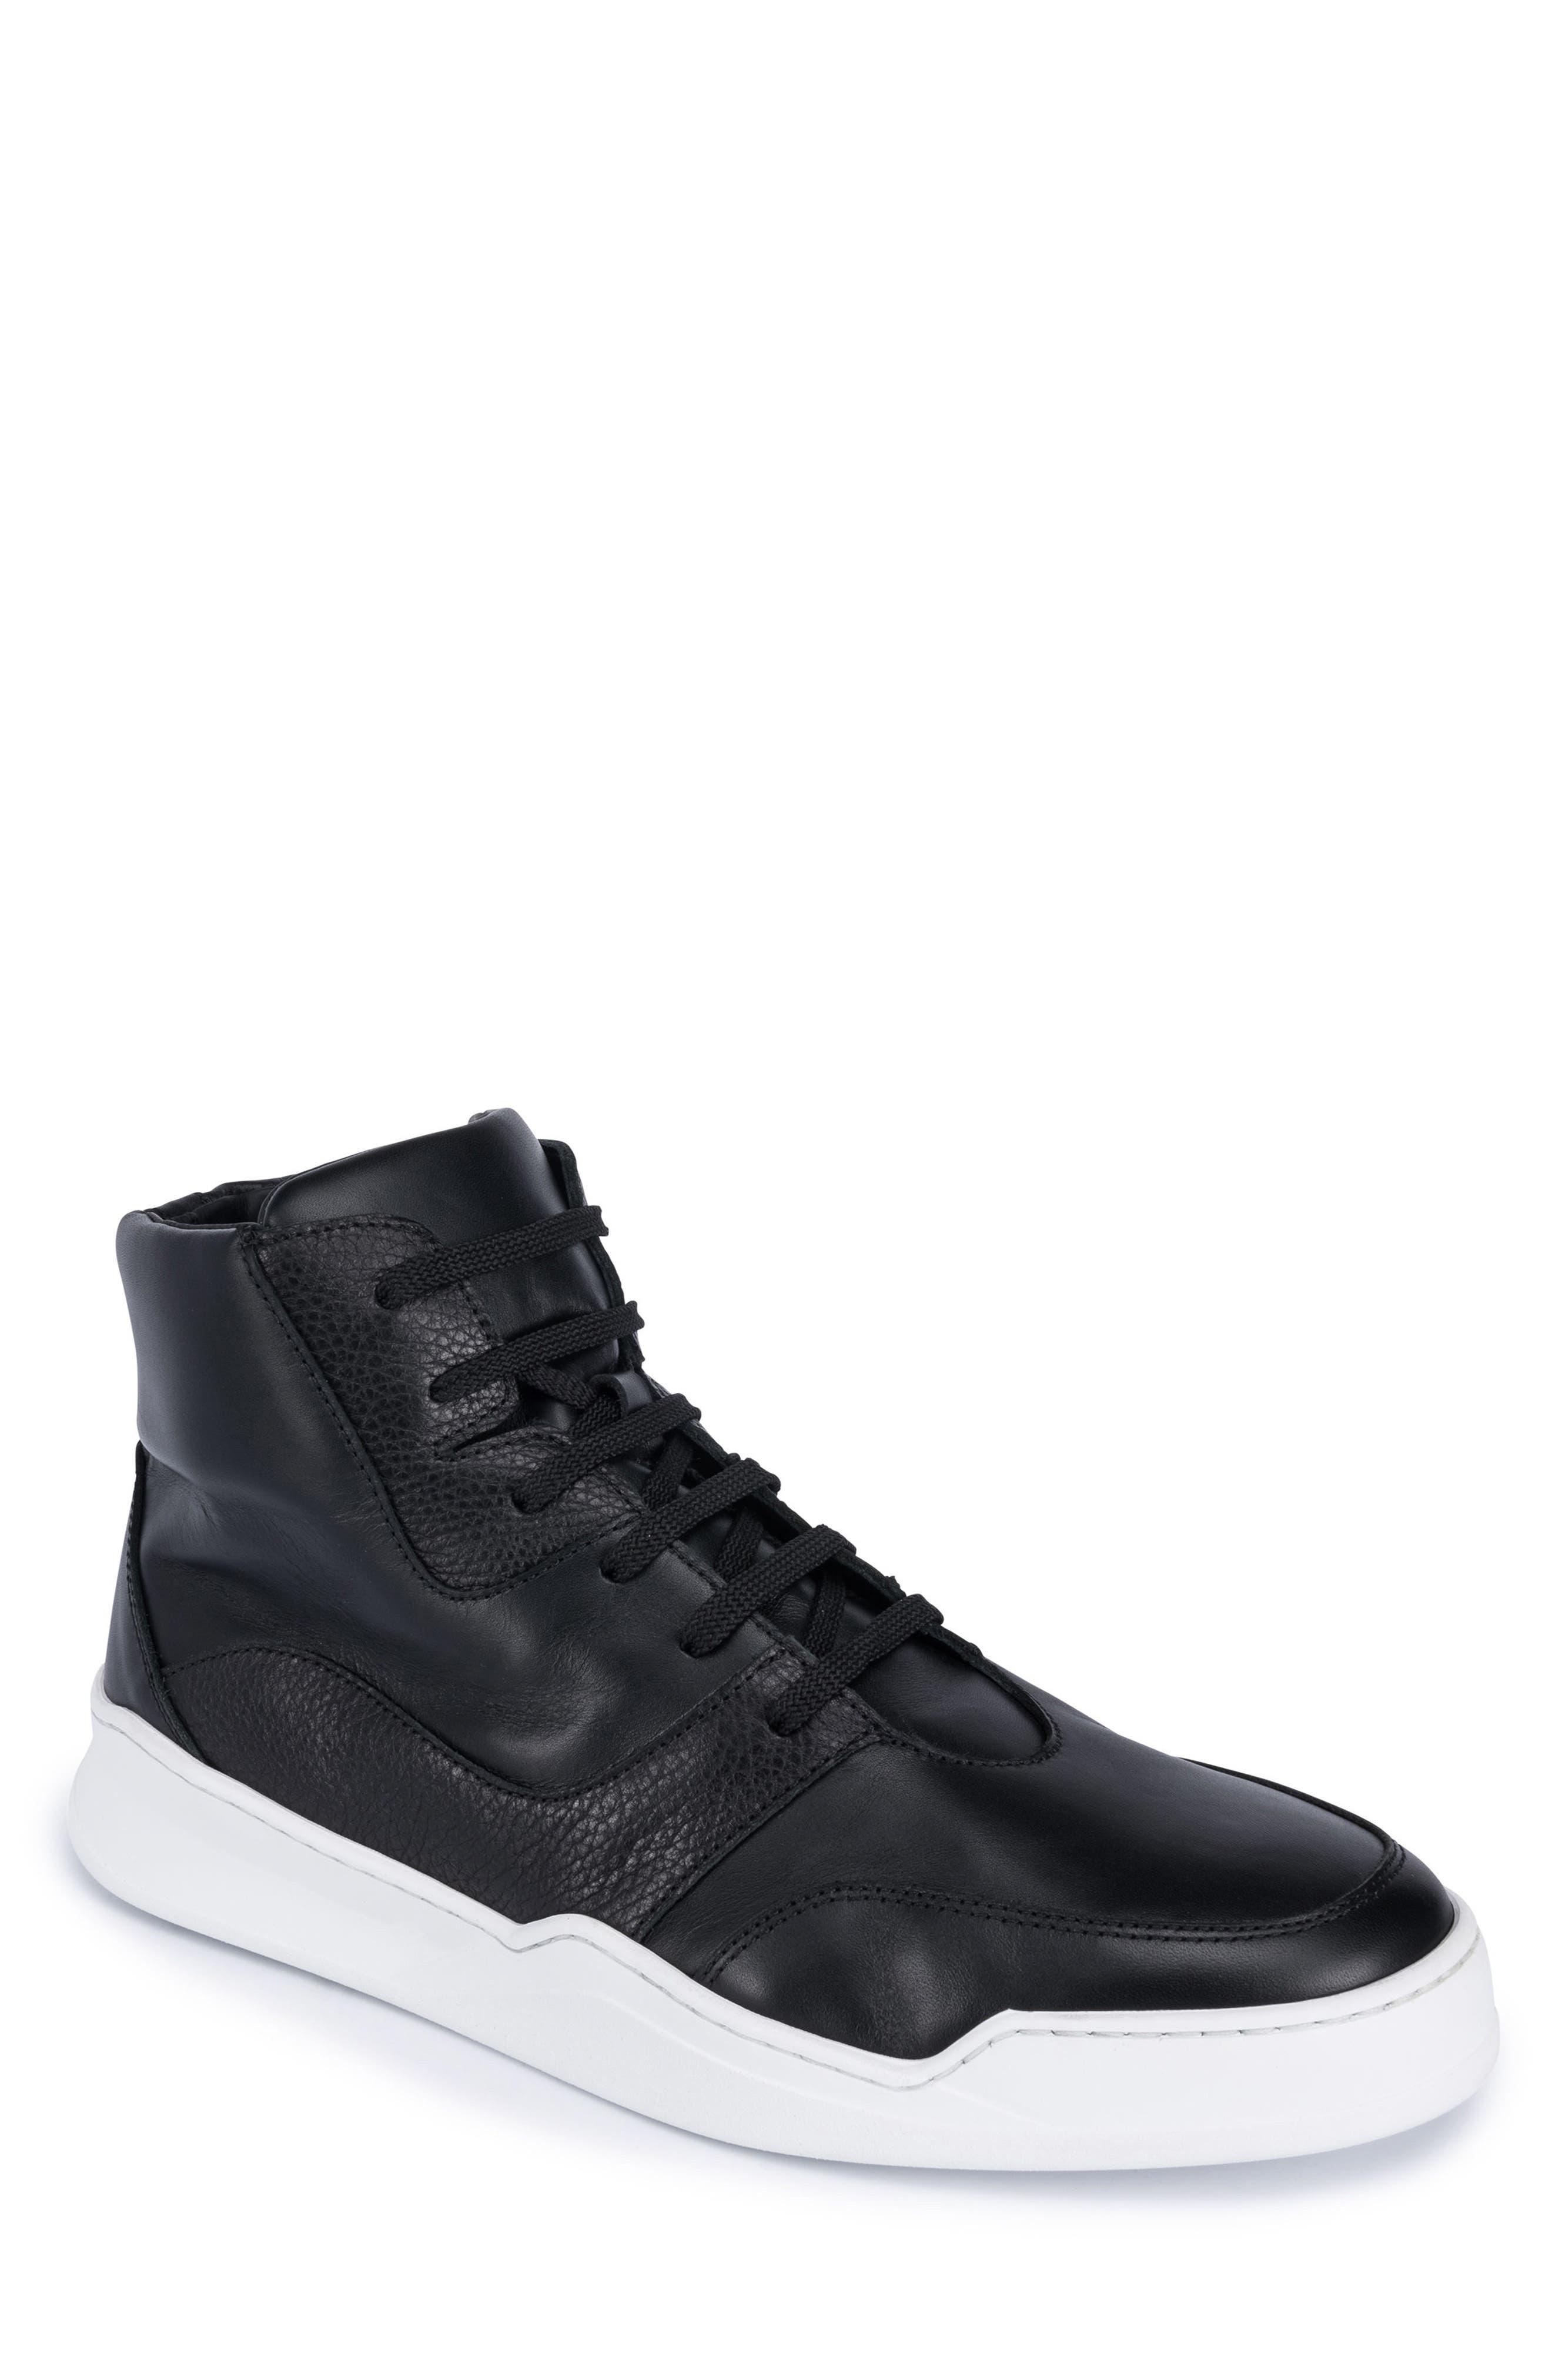 Carrara Sneaker,                             Main thumbnail 1, color,                             001